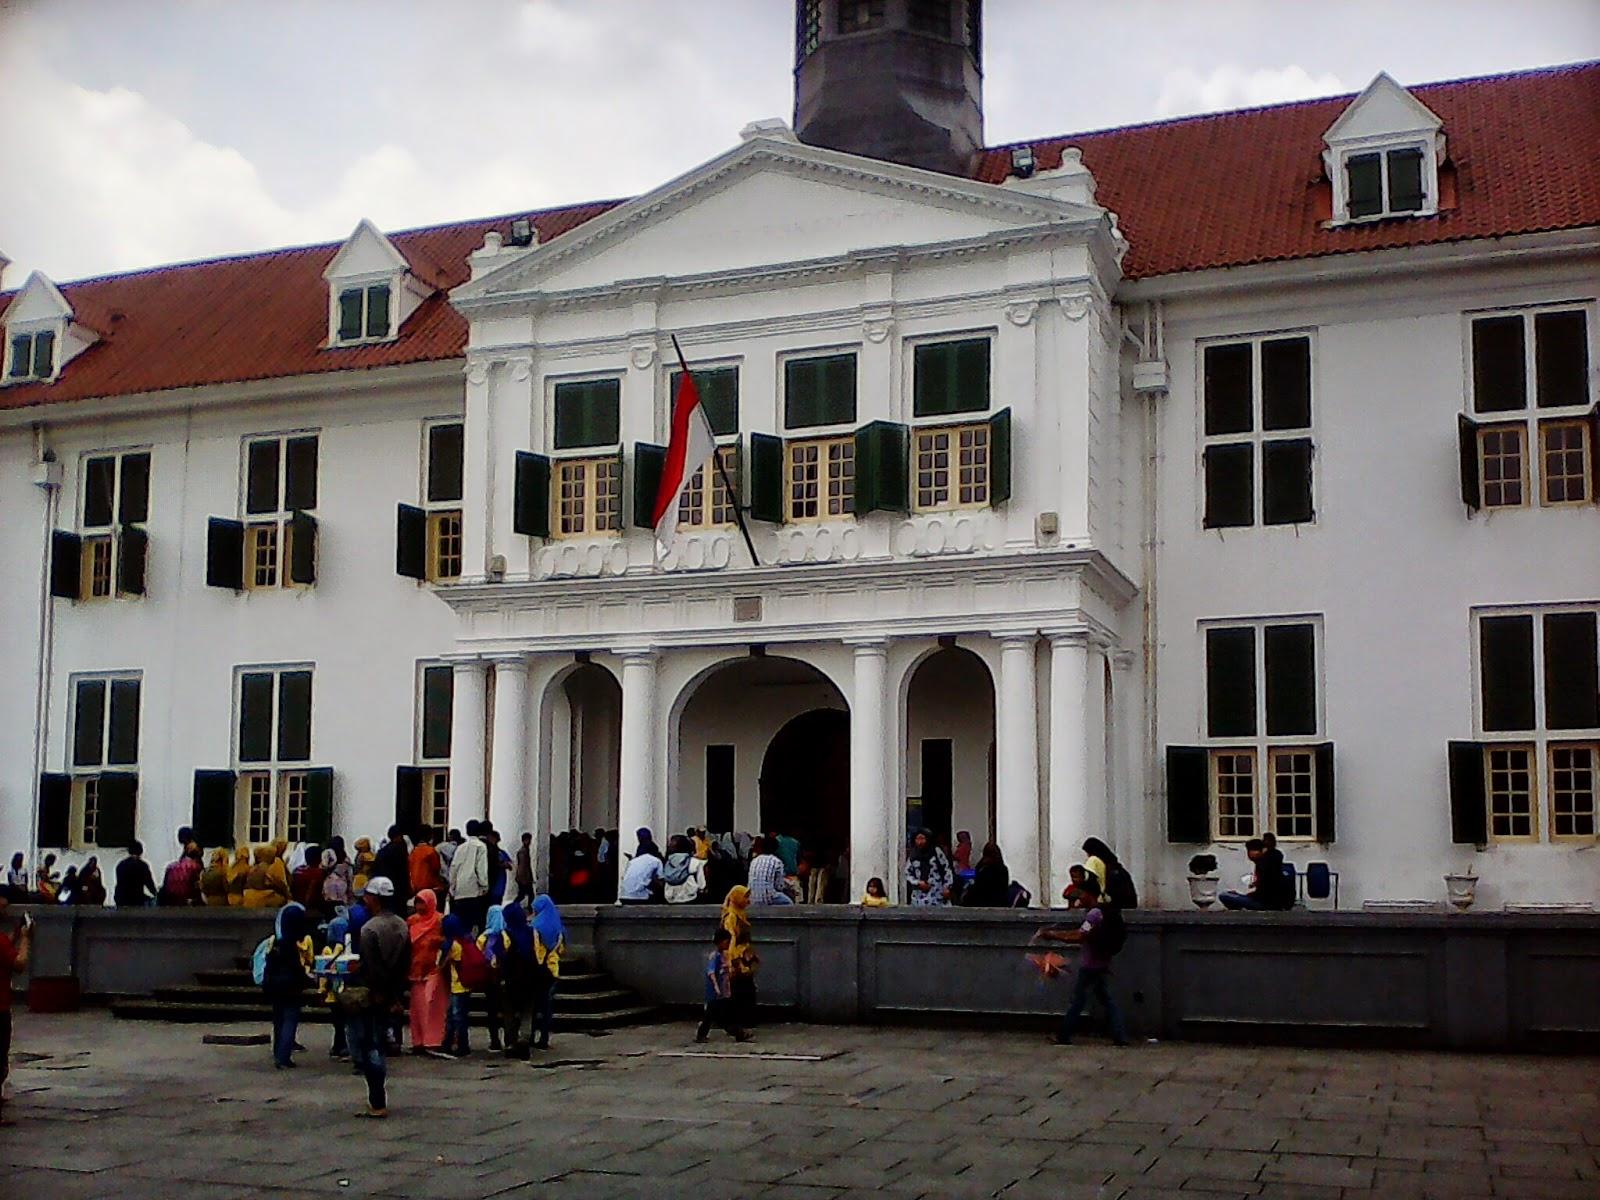 Tentang Jakarta Musium Fatahillah Kota Administrasi Barat